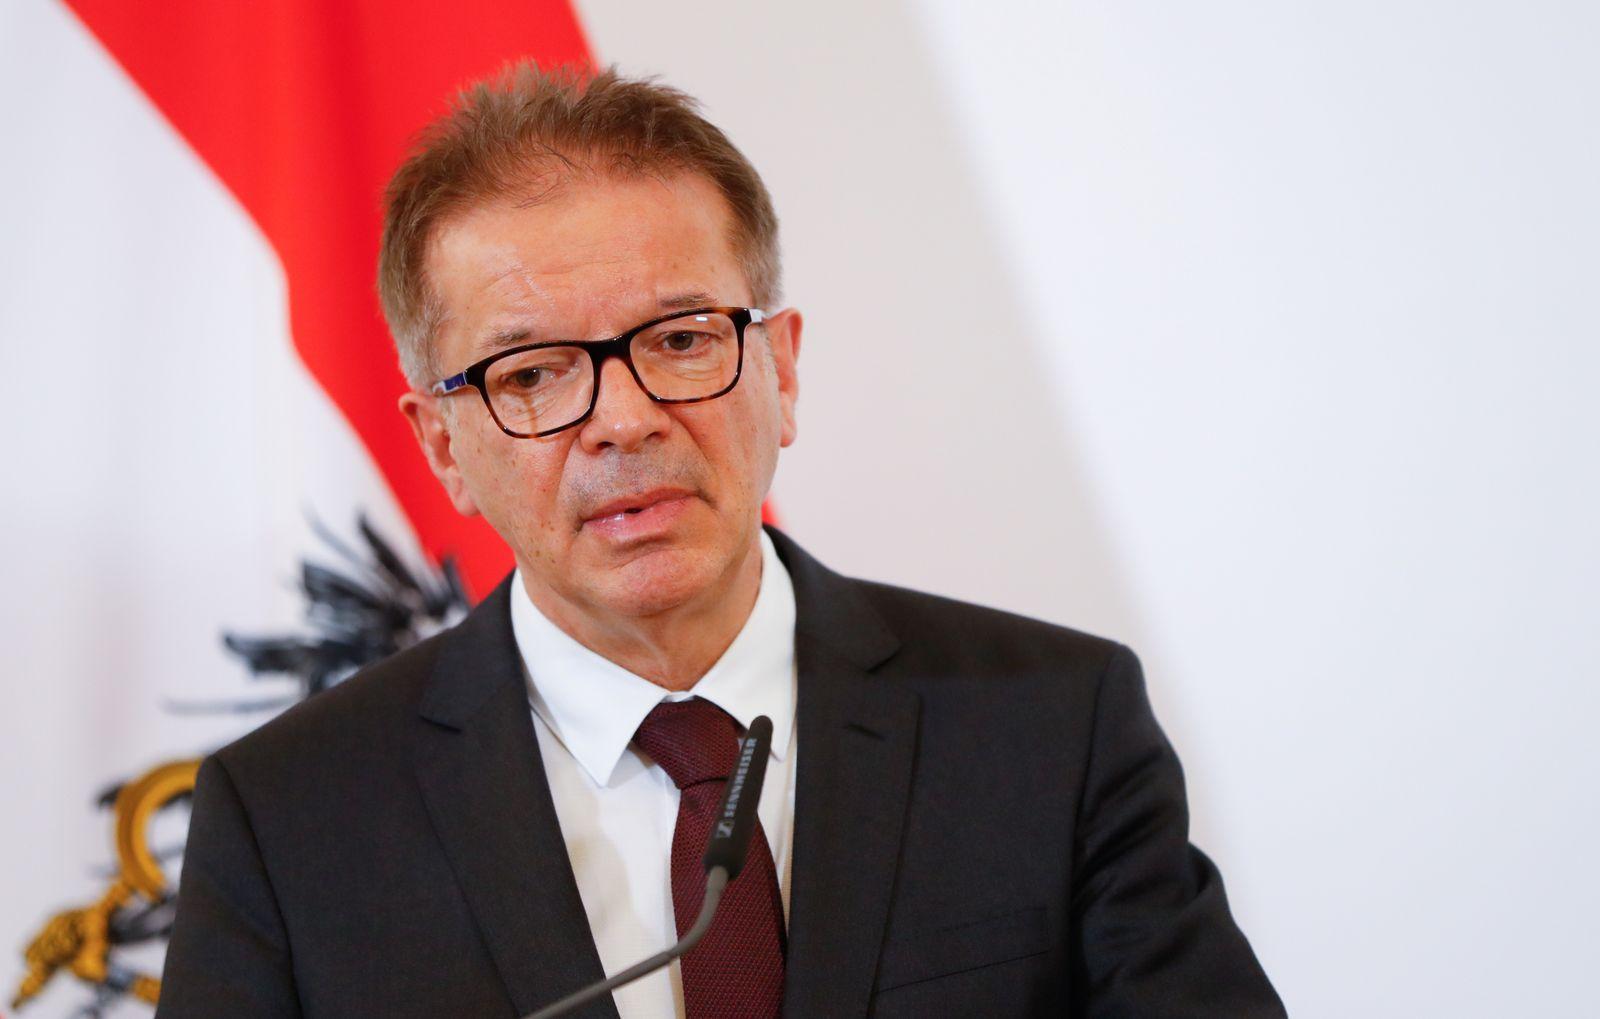 Health Minister Rudolf Anschober addresses the media in Vienna